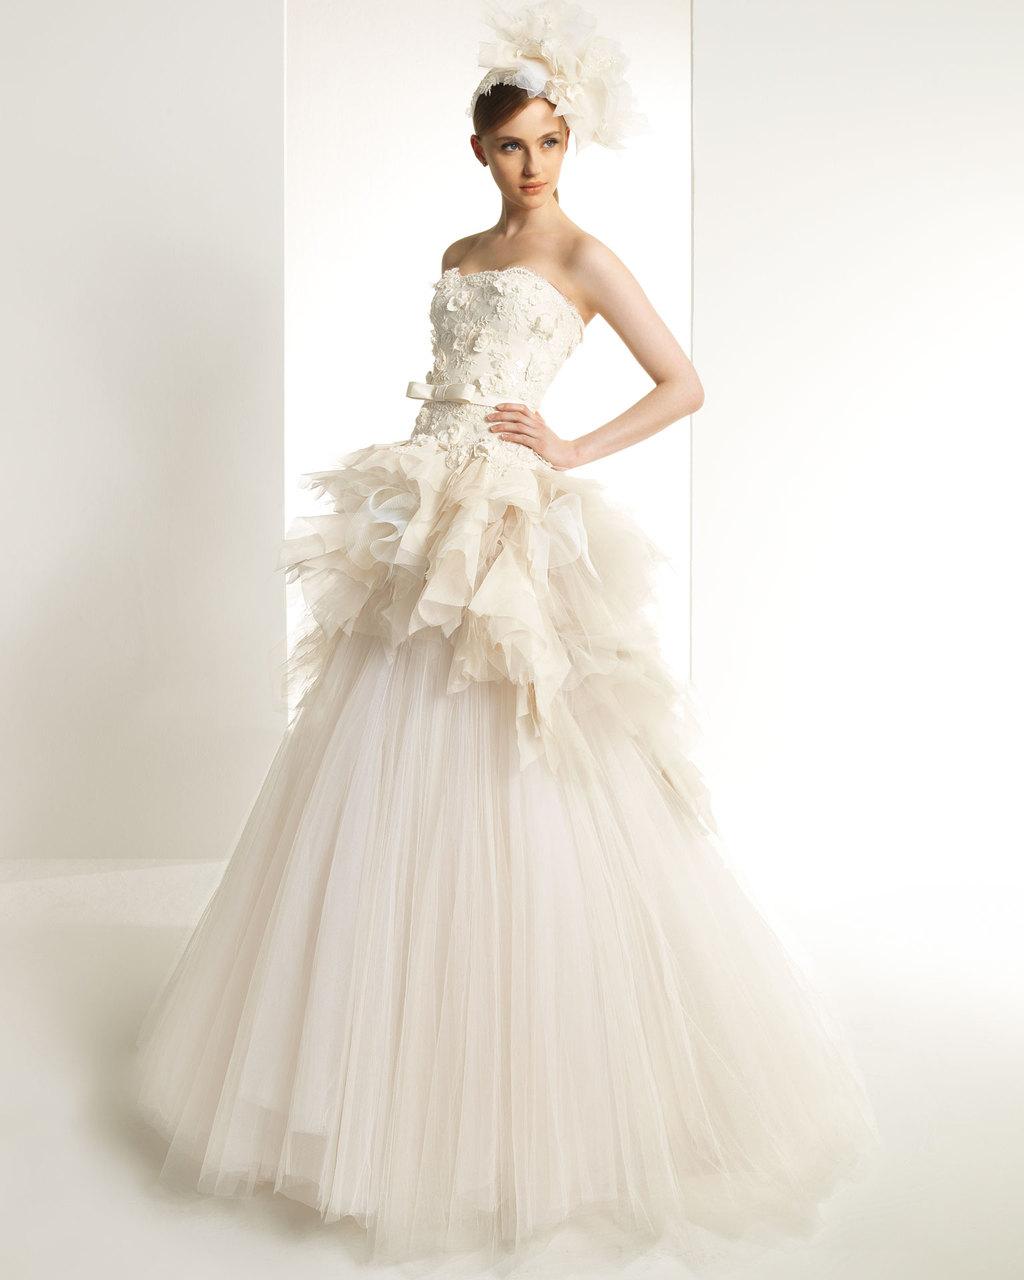 2013-wedding-dress-zuhair-murad-for-rosa-clara-bridal-gowns-102.full